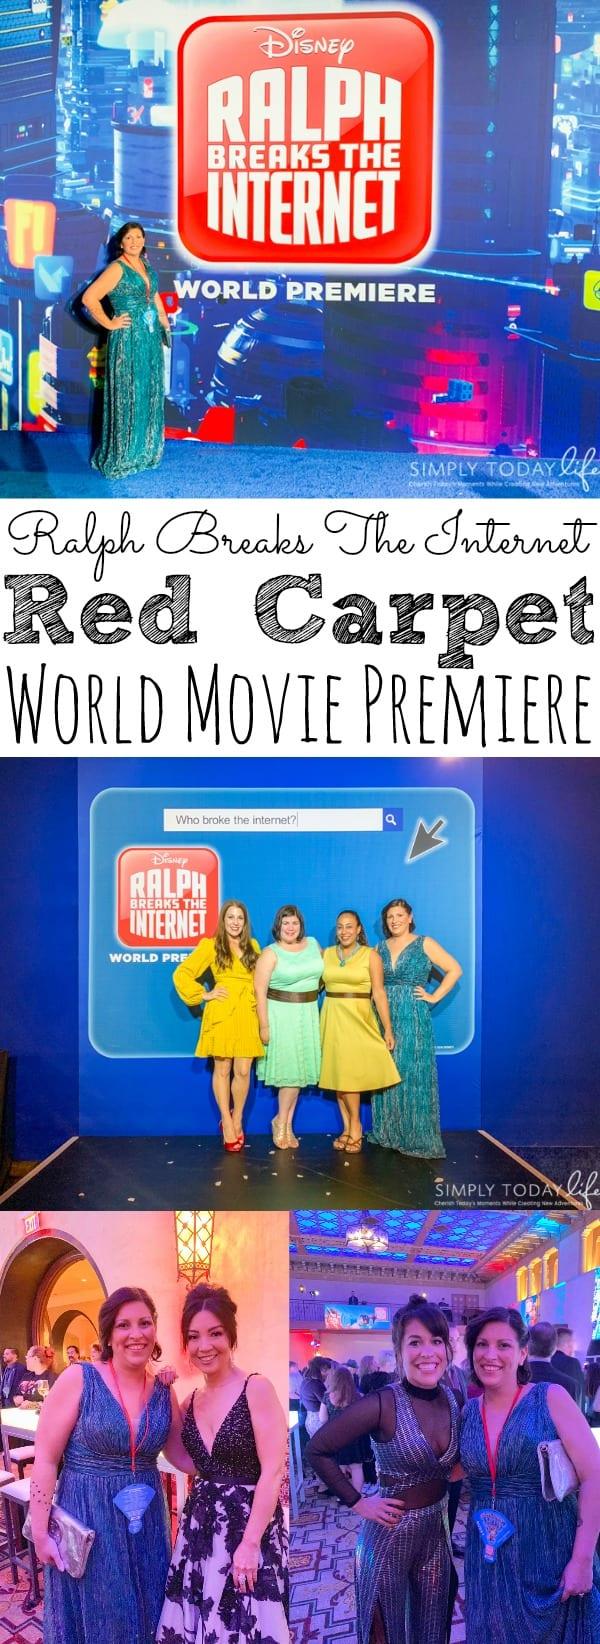 Ralph Breaks The Internet Movie Premiere Experience